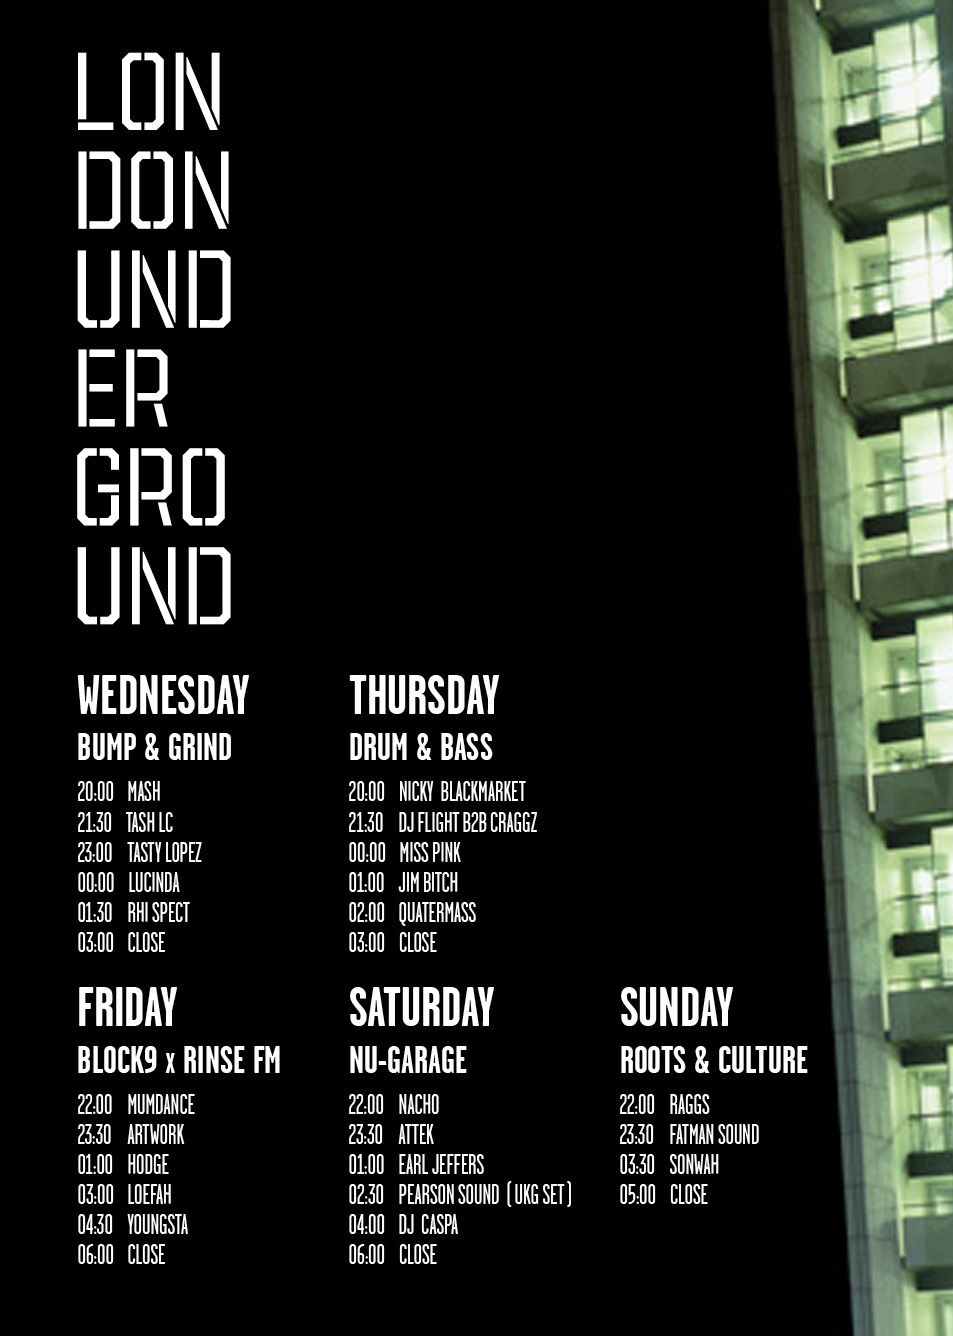 London Underground Full 2017